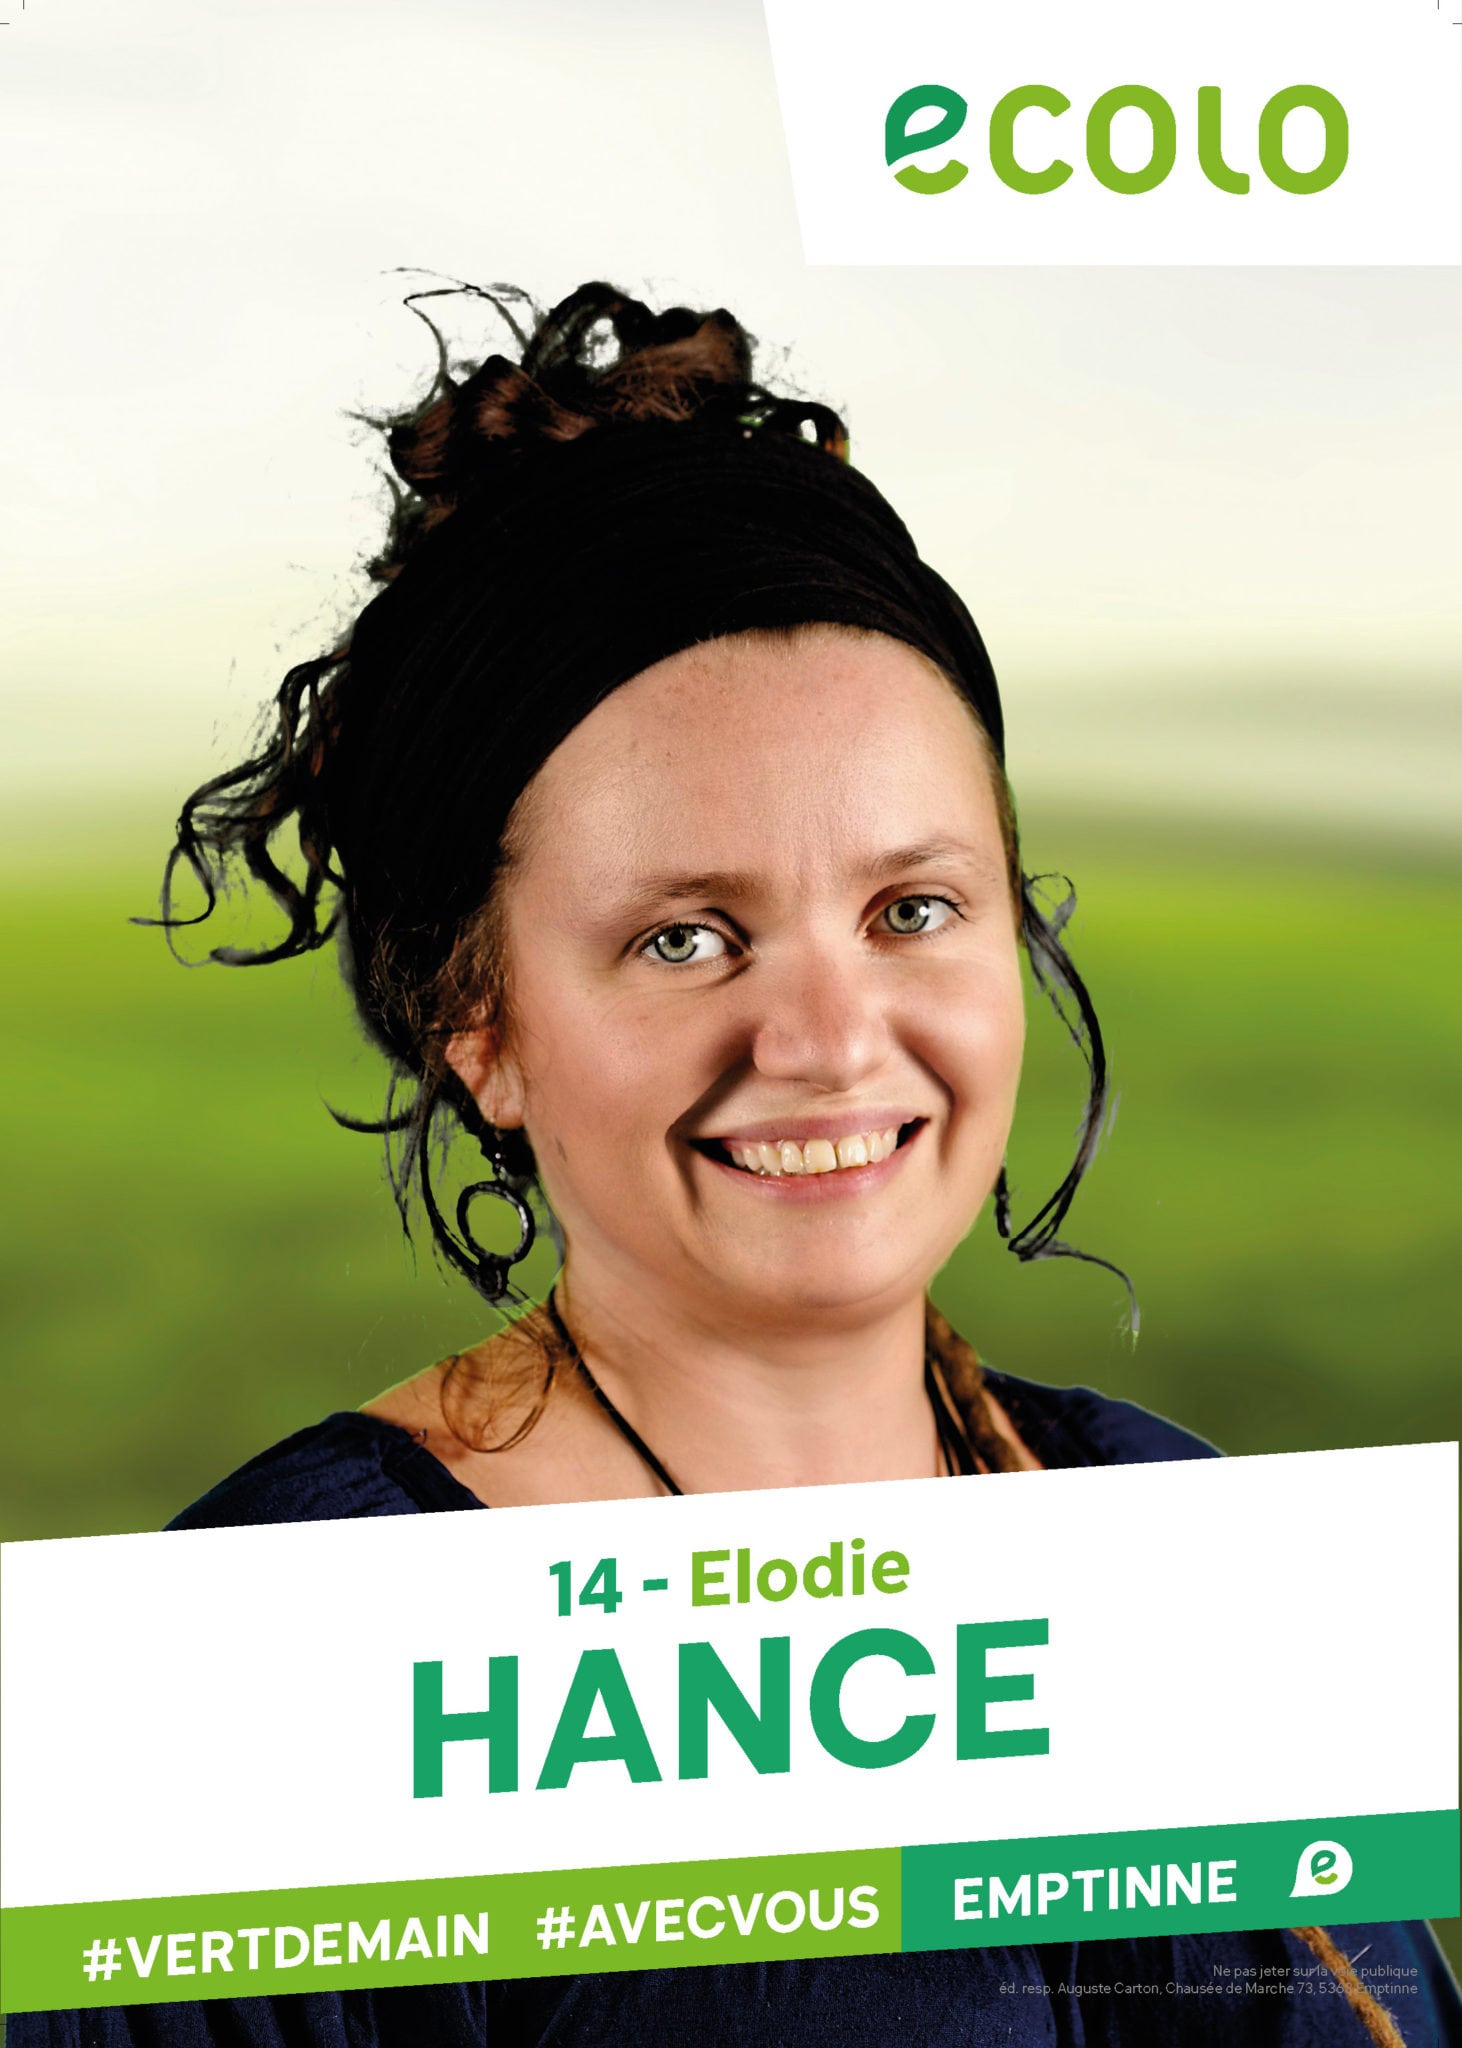 14 - Elodie HANCE